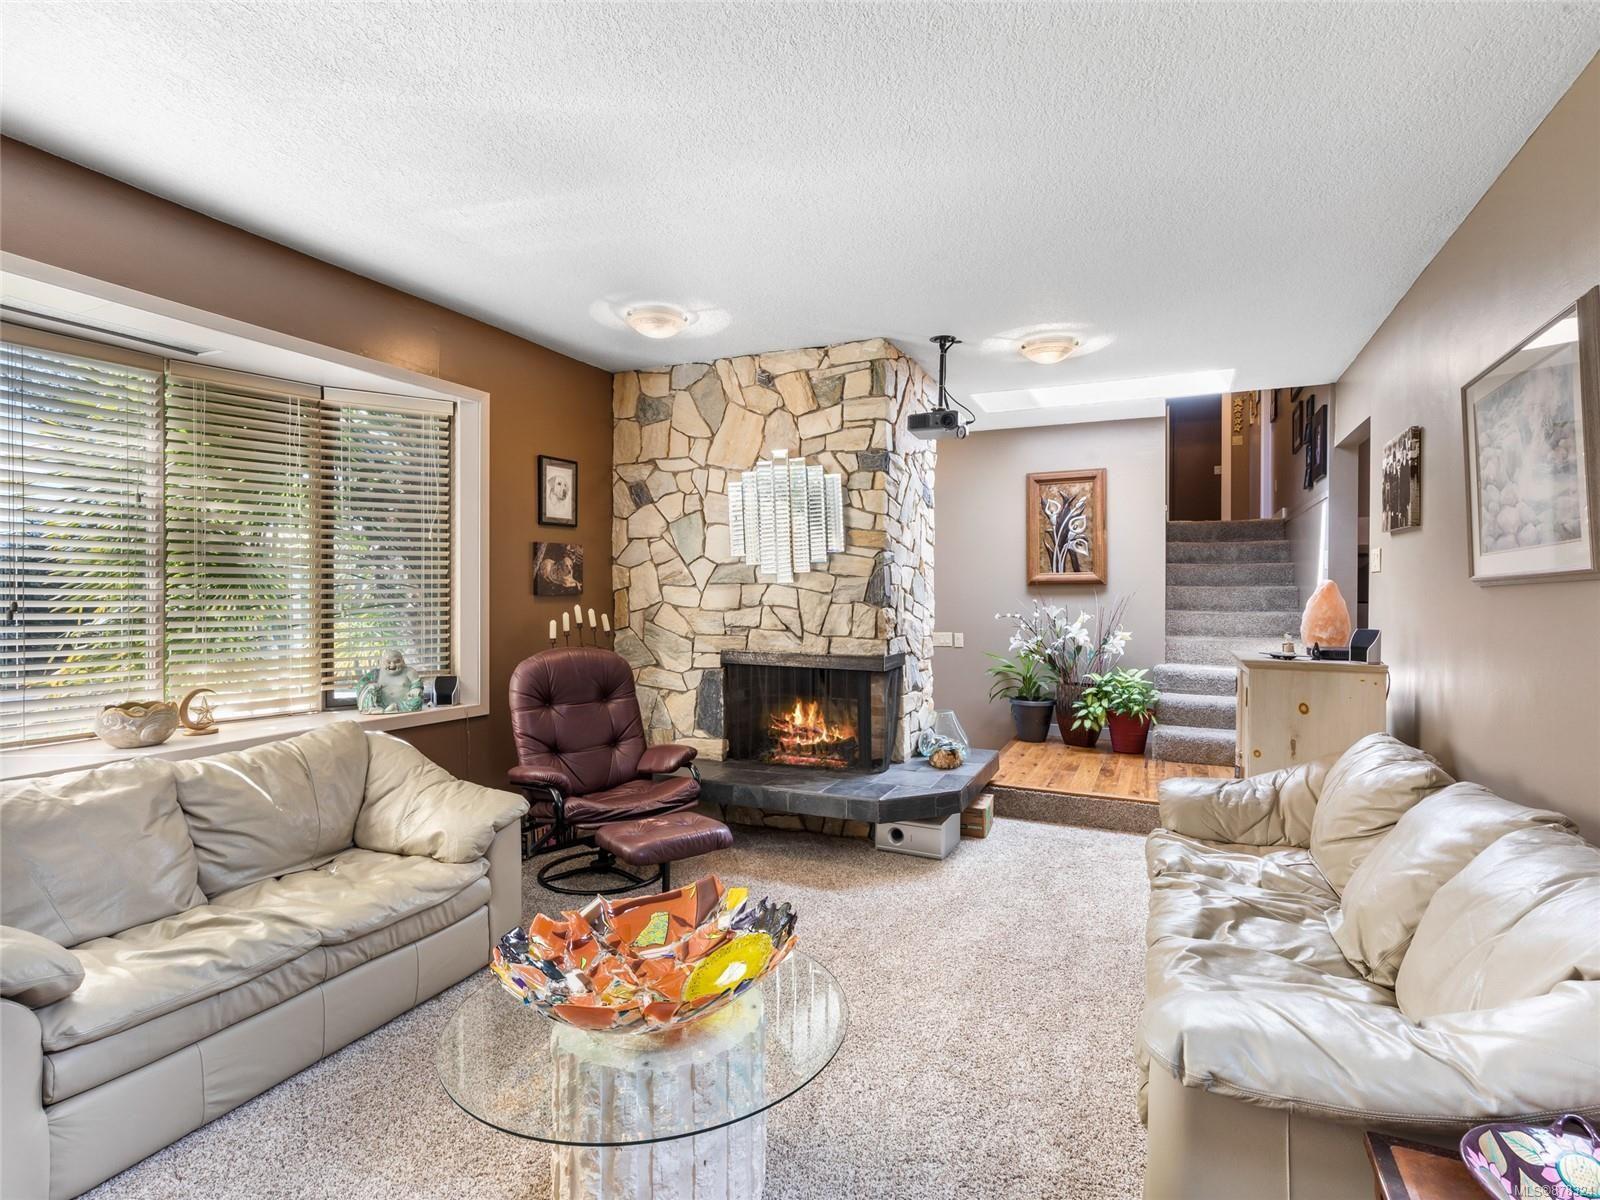 Photo 18: Photos: 3875 Moore Rd in : PA Port Alberni House for sale (Port Alberni)  : MLS®# 878324